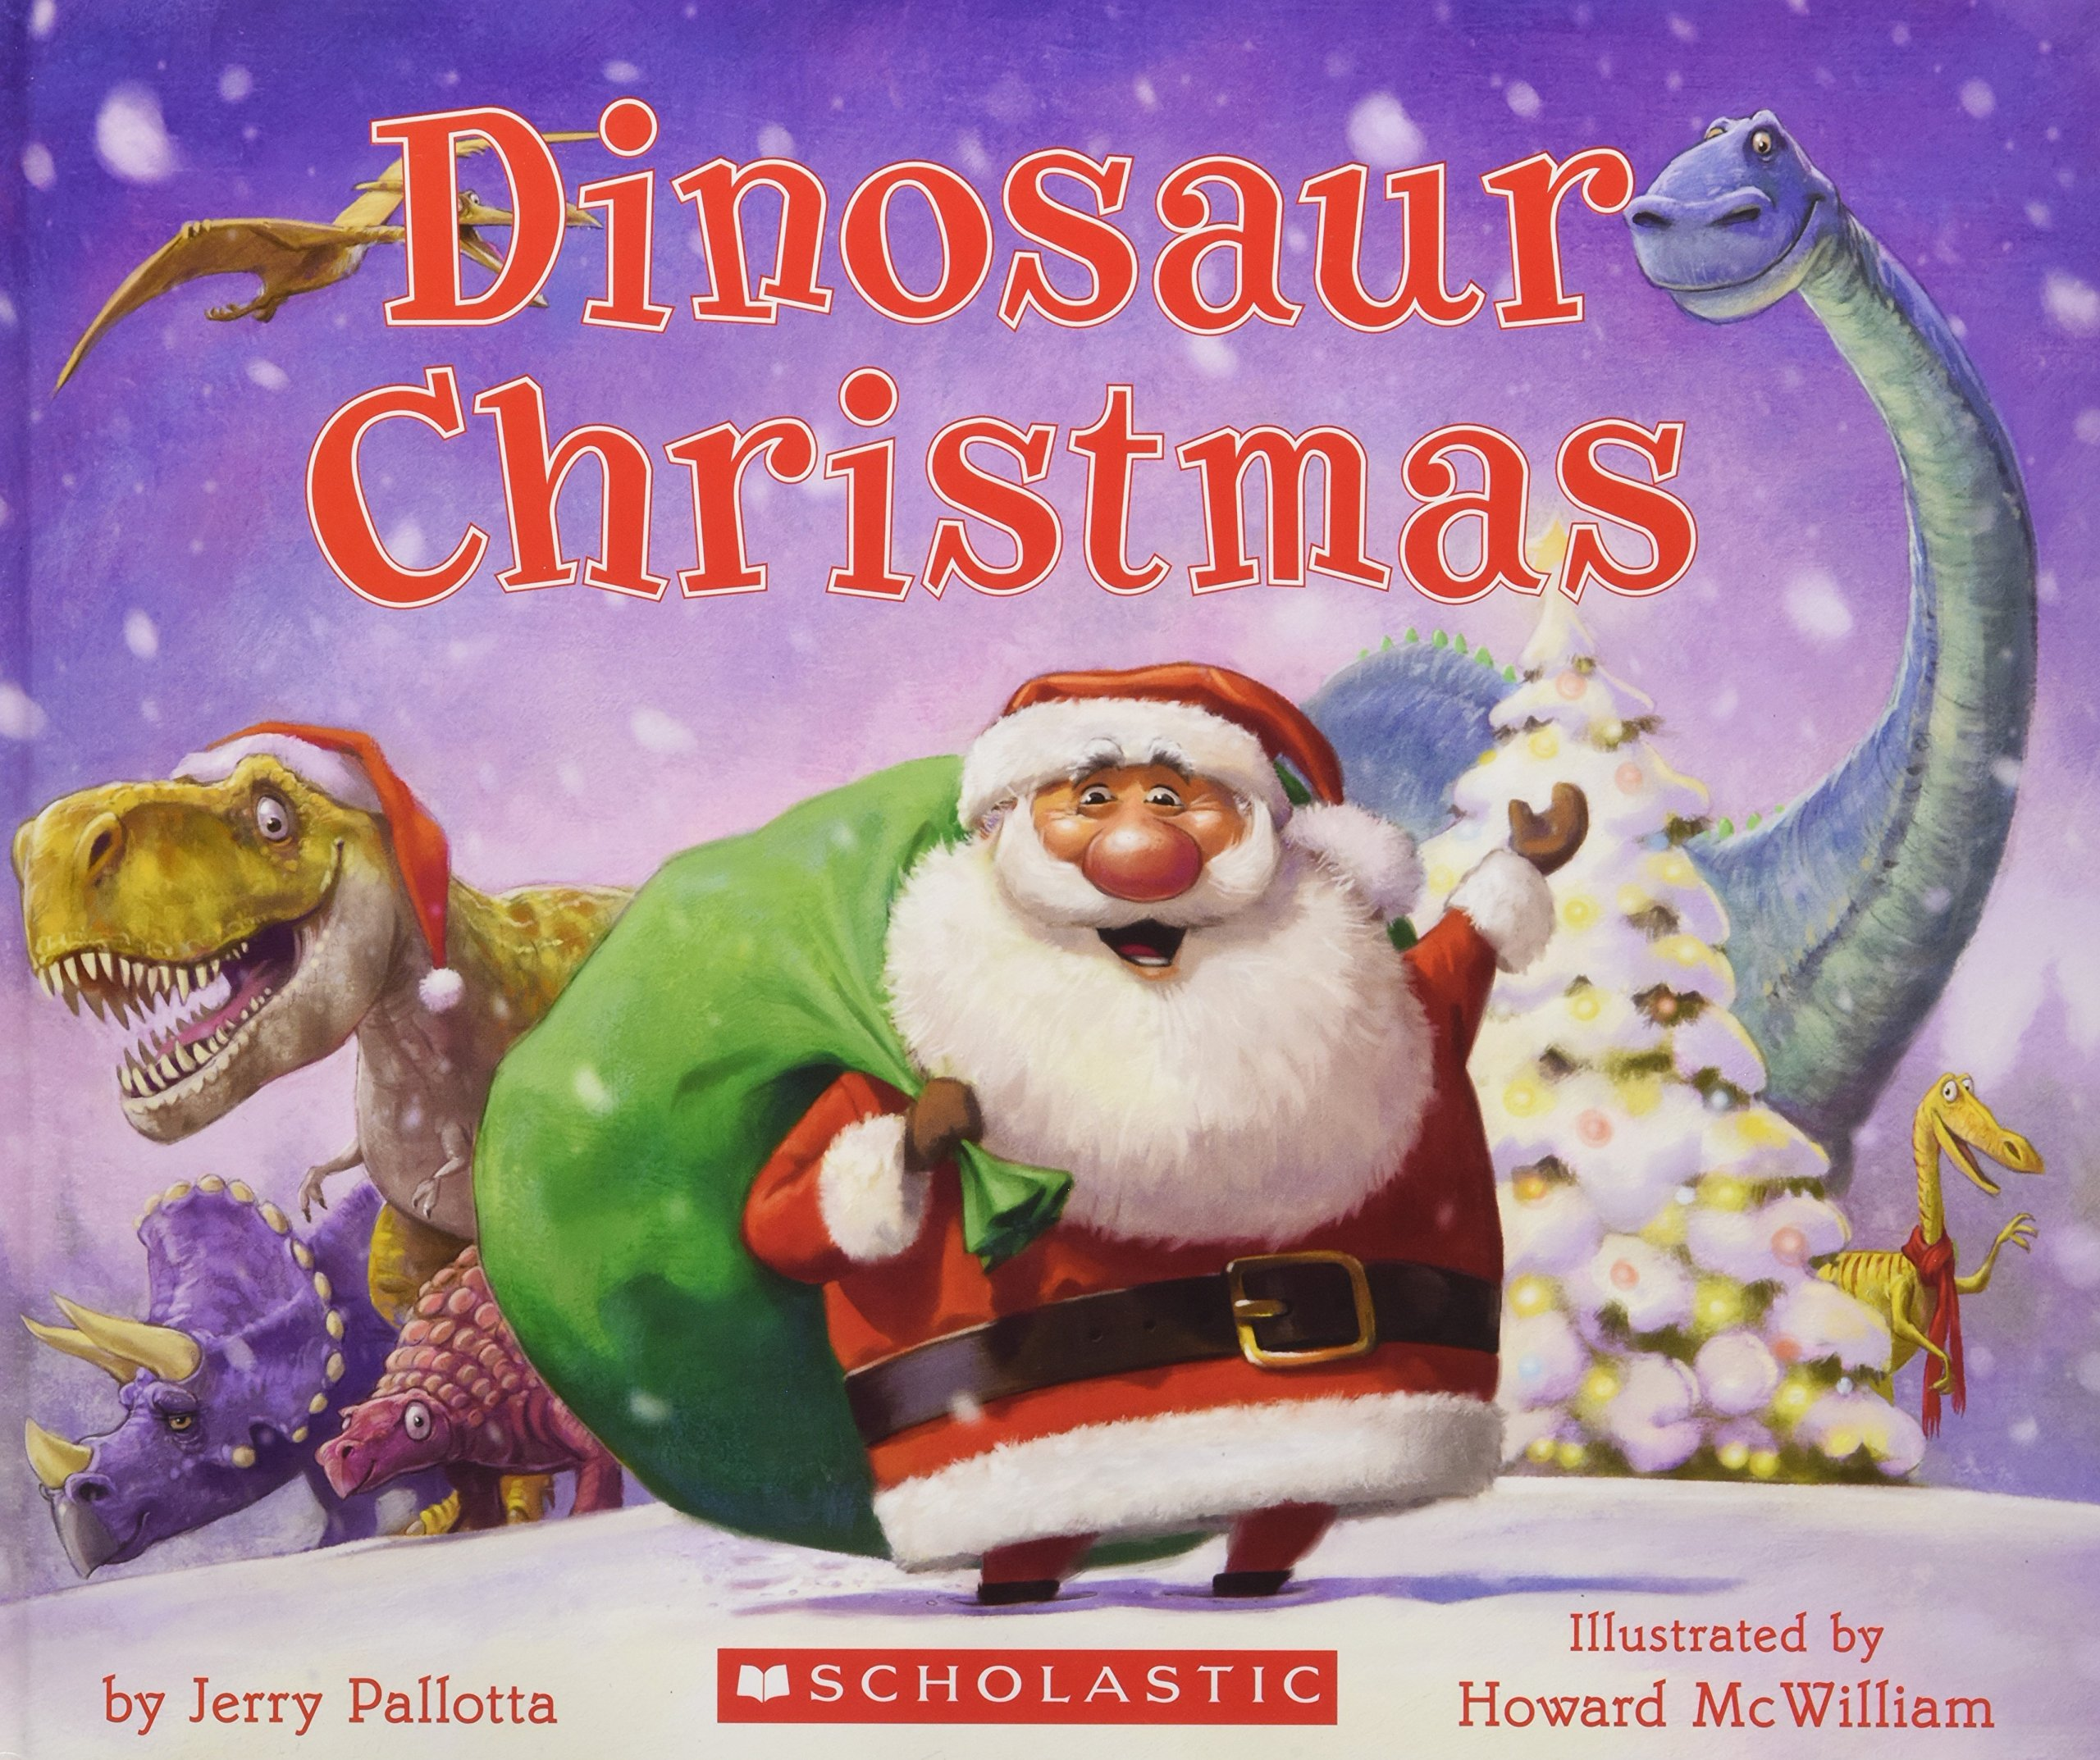 Dinosaur Christmas.Dinosaur Christmas Jerry Pallotta Howard Mcwilliam